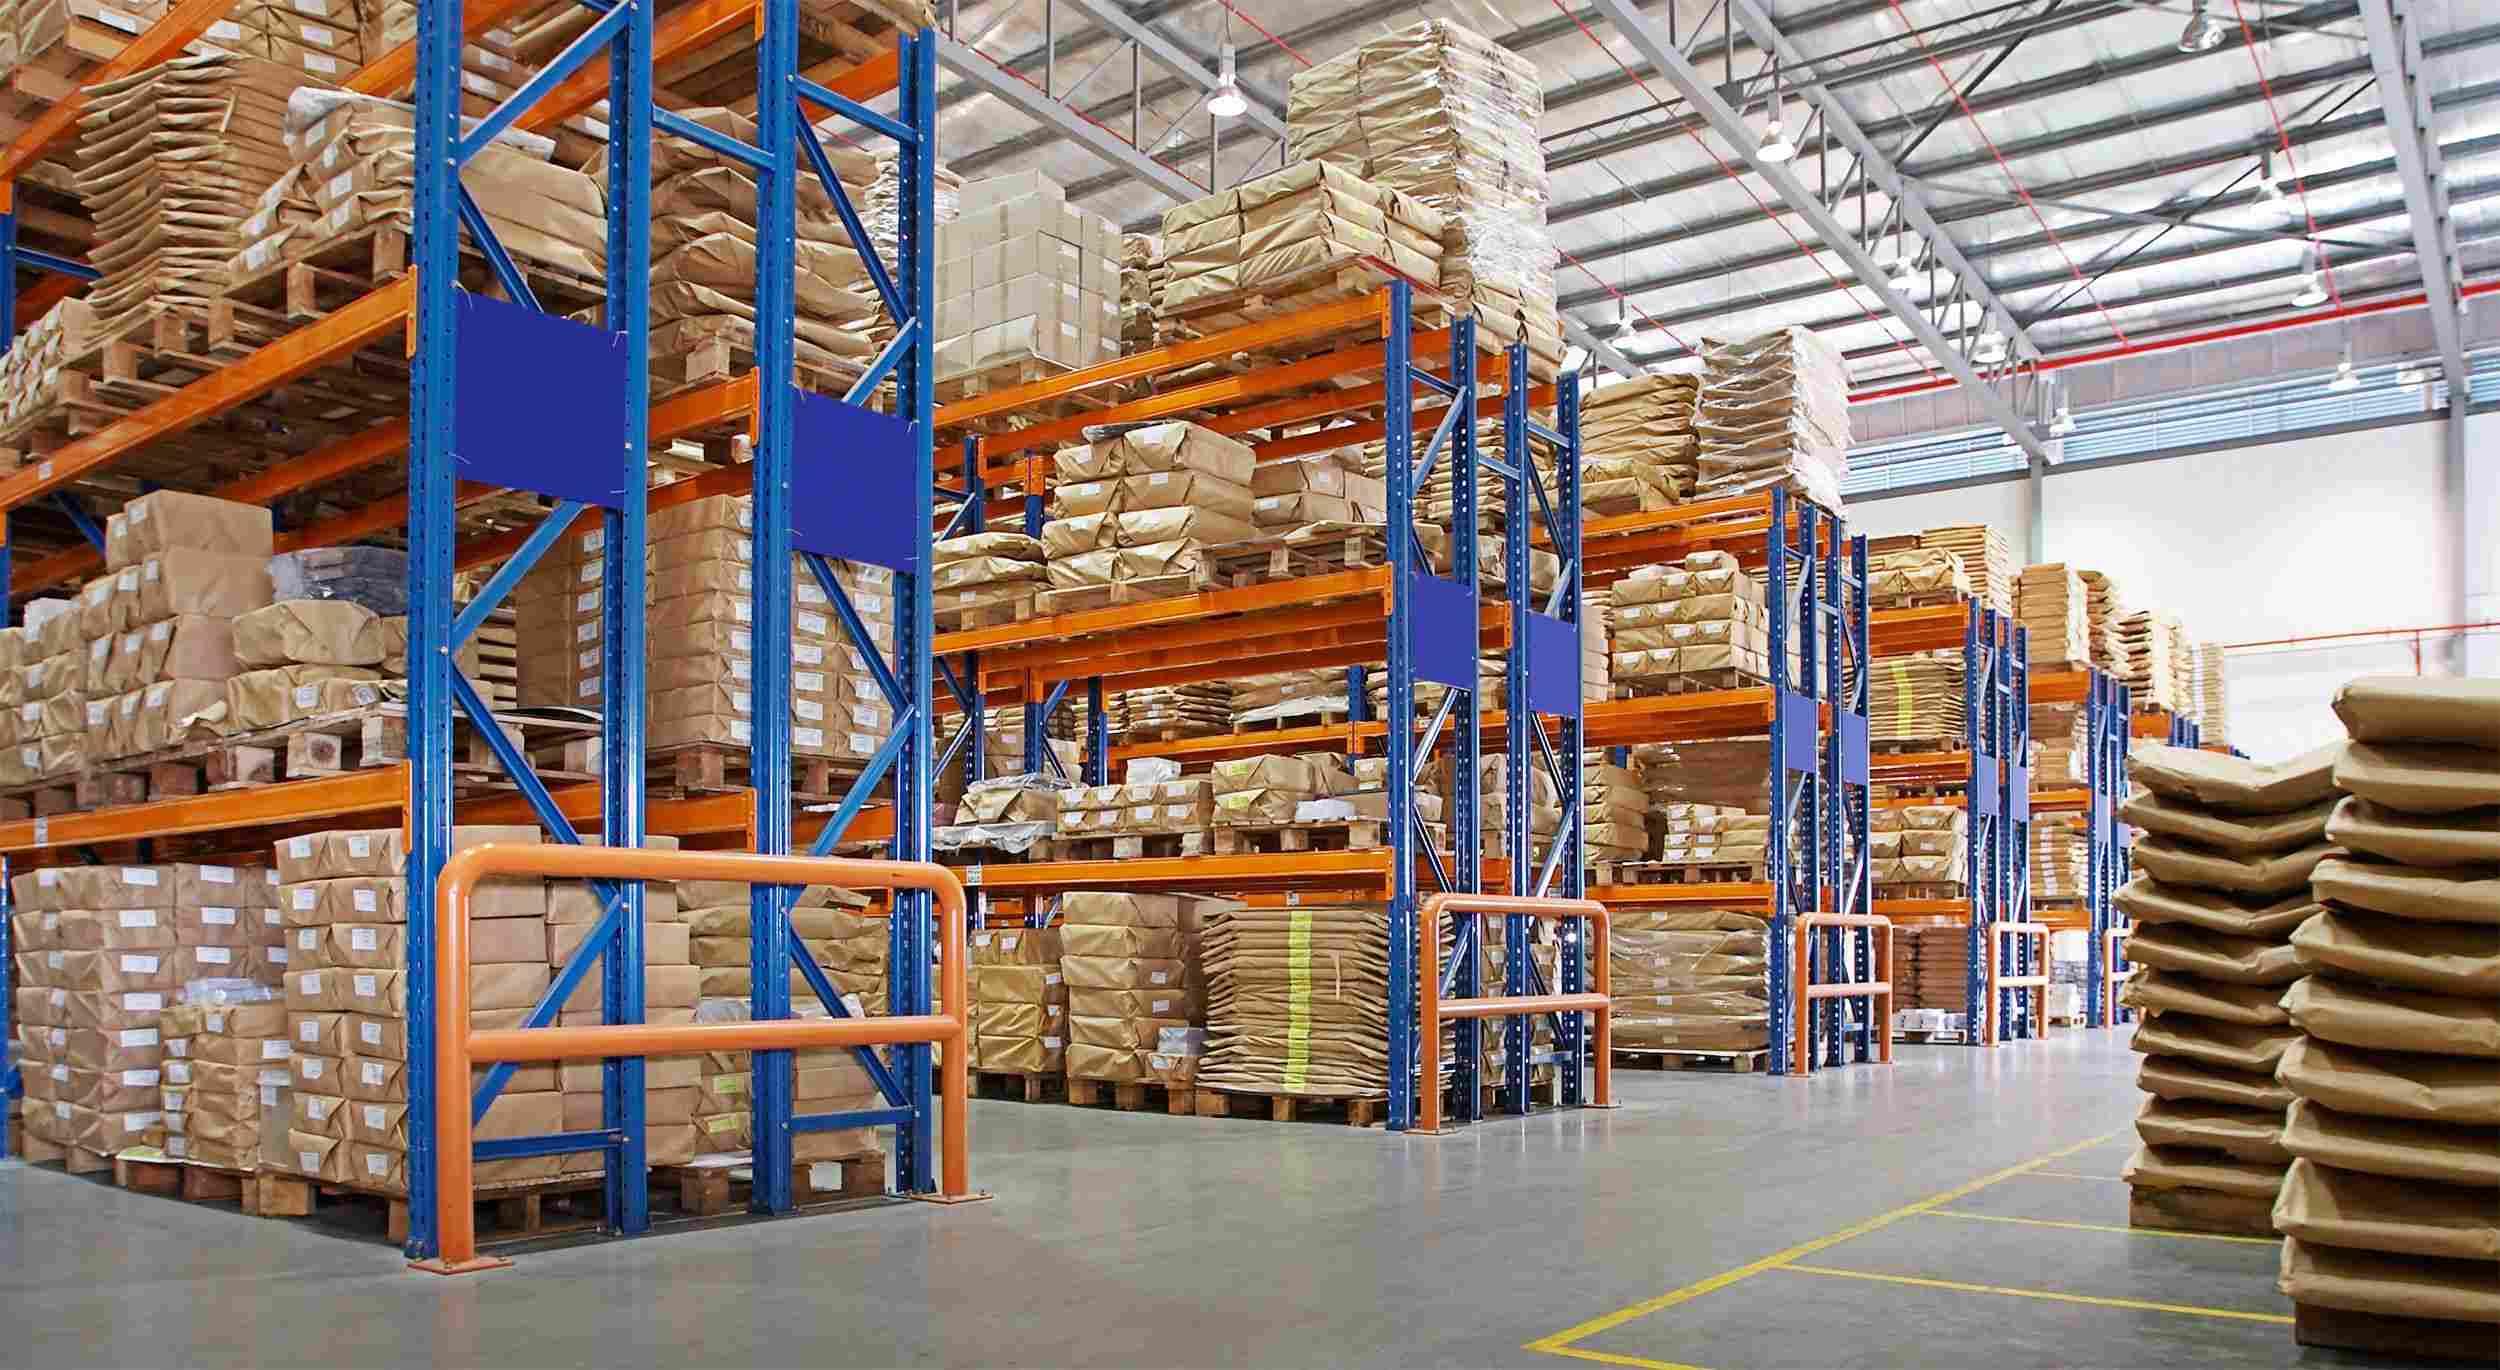 is the term green logistics an